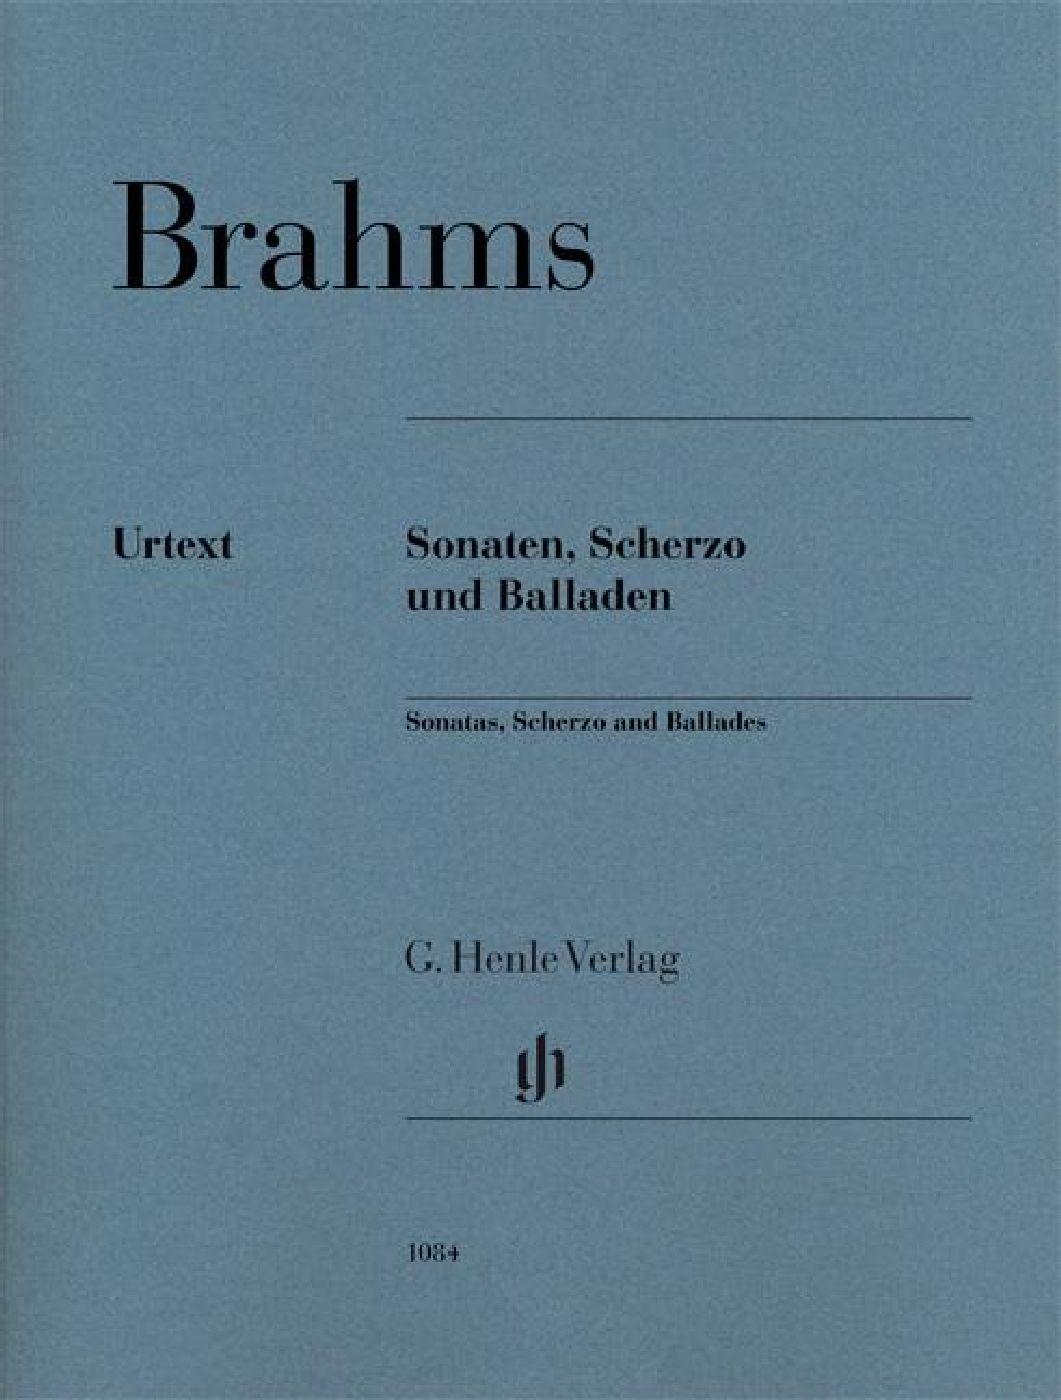 Johannes Brahms - Sonatas, Scherzo And Ballads Pb - Piano